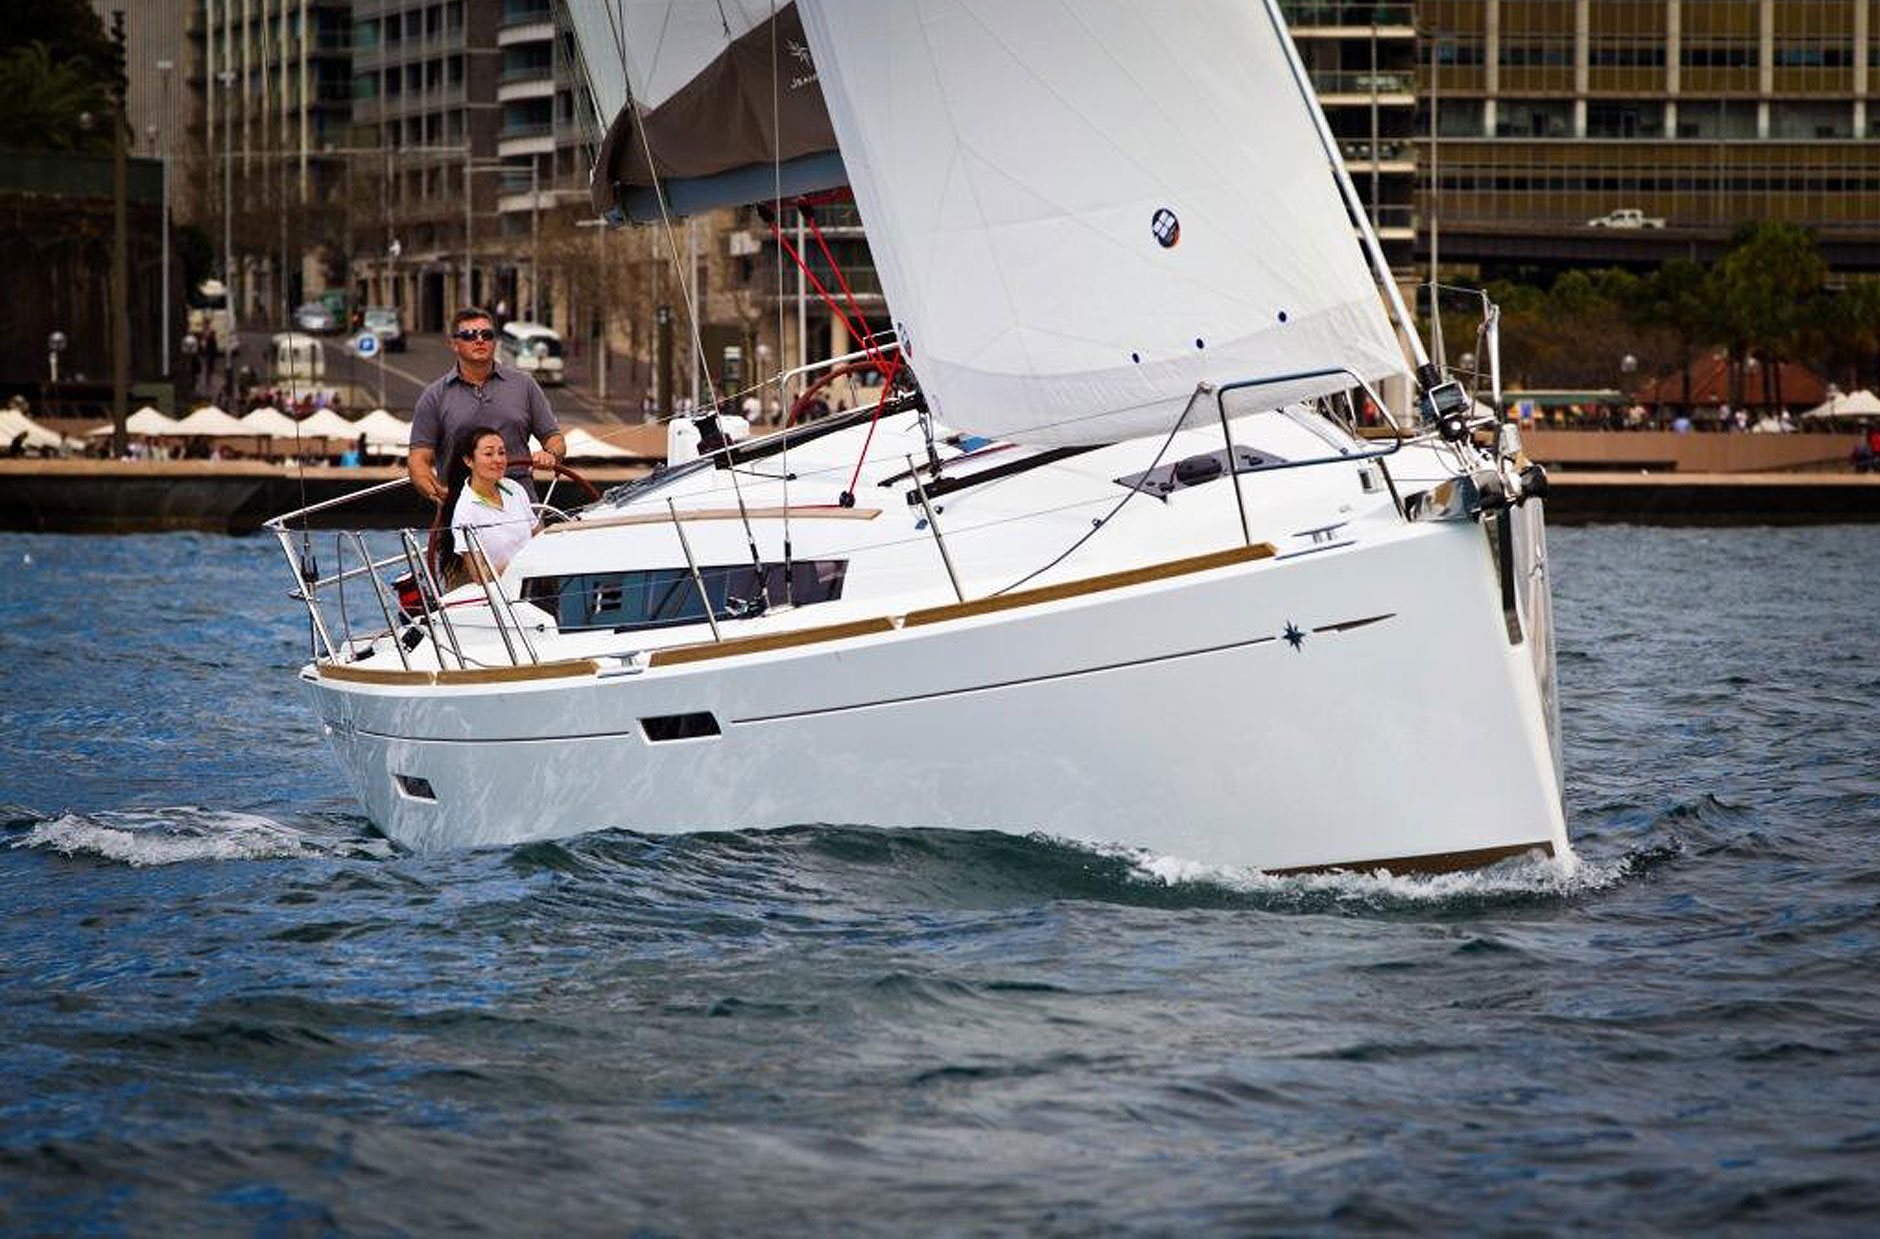 jeanneau-sun-odyssey-379-2-set-sail.jpg